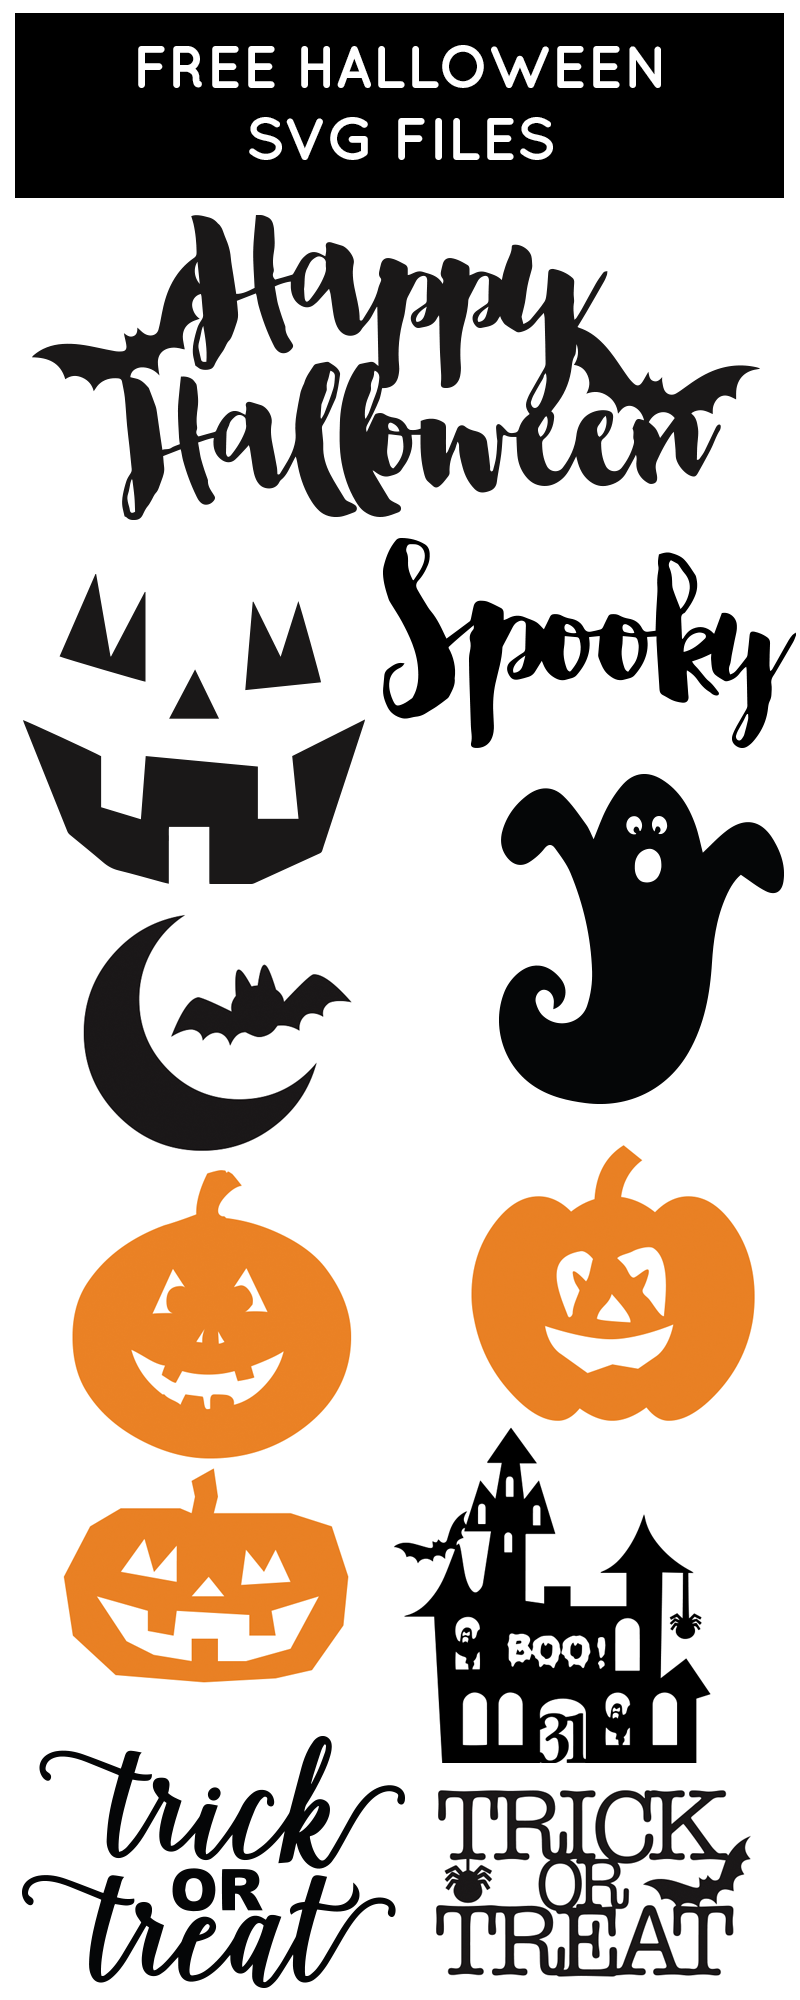 free halloween svg files from  chicfetti free svg files Vintage Thanksgiving Clip Art Vintage Halloween Skeleton Clip Art